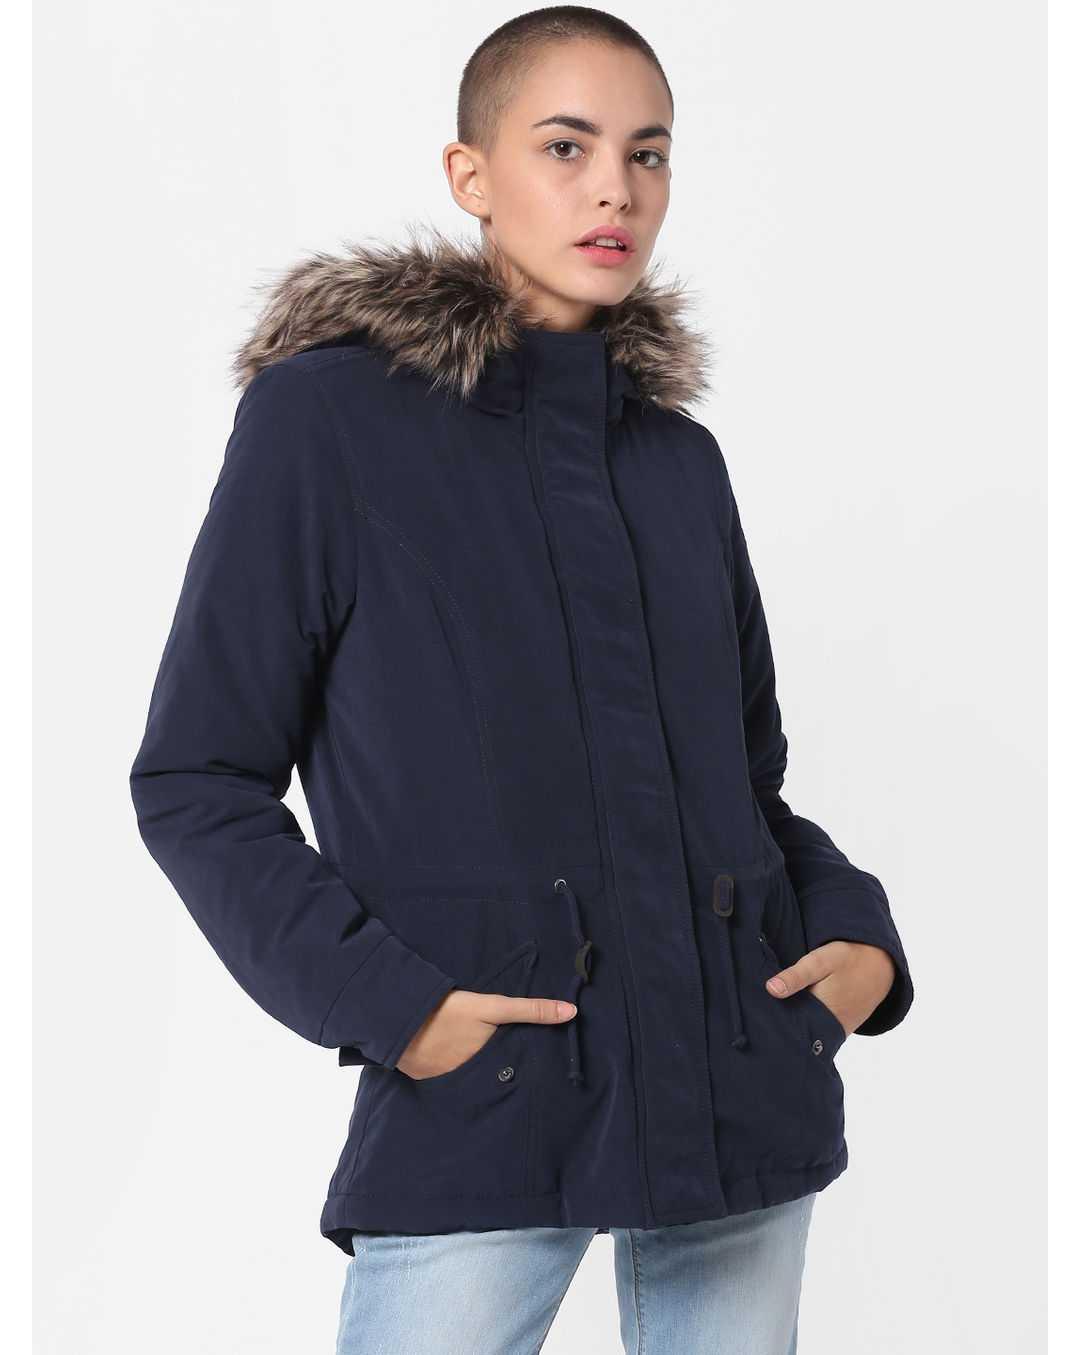 parka jacket for women